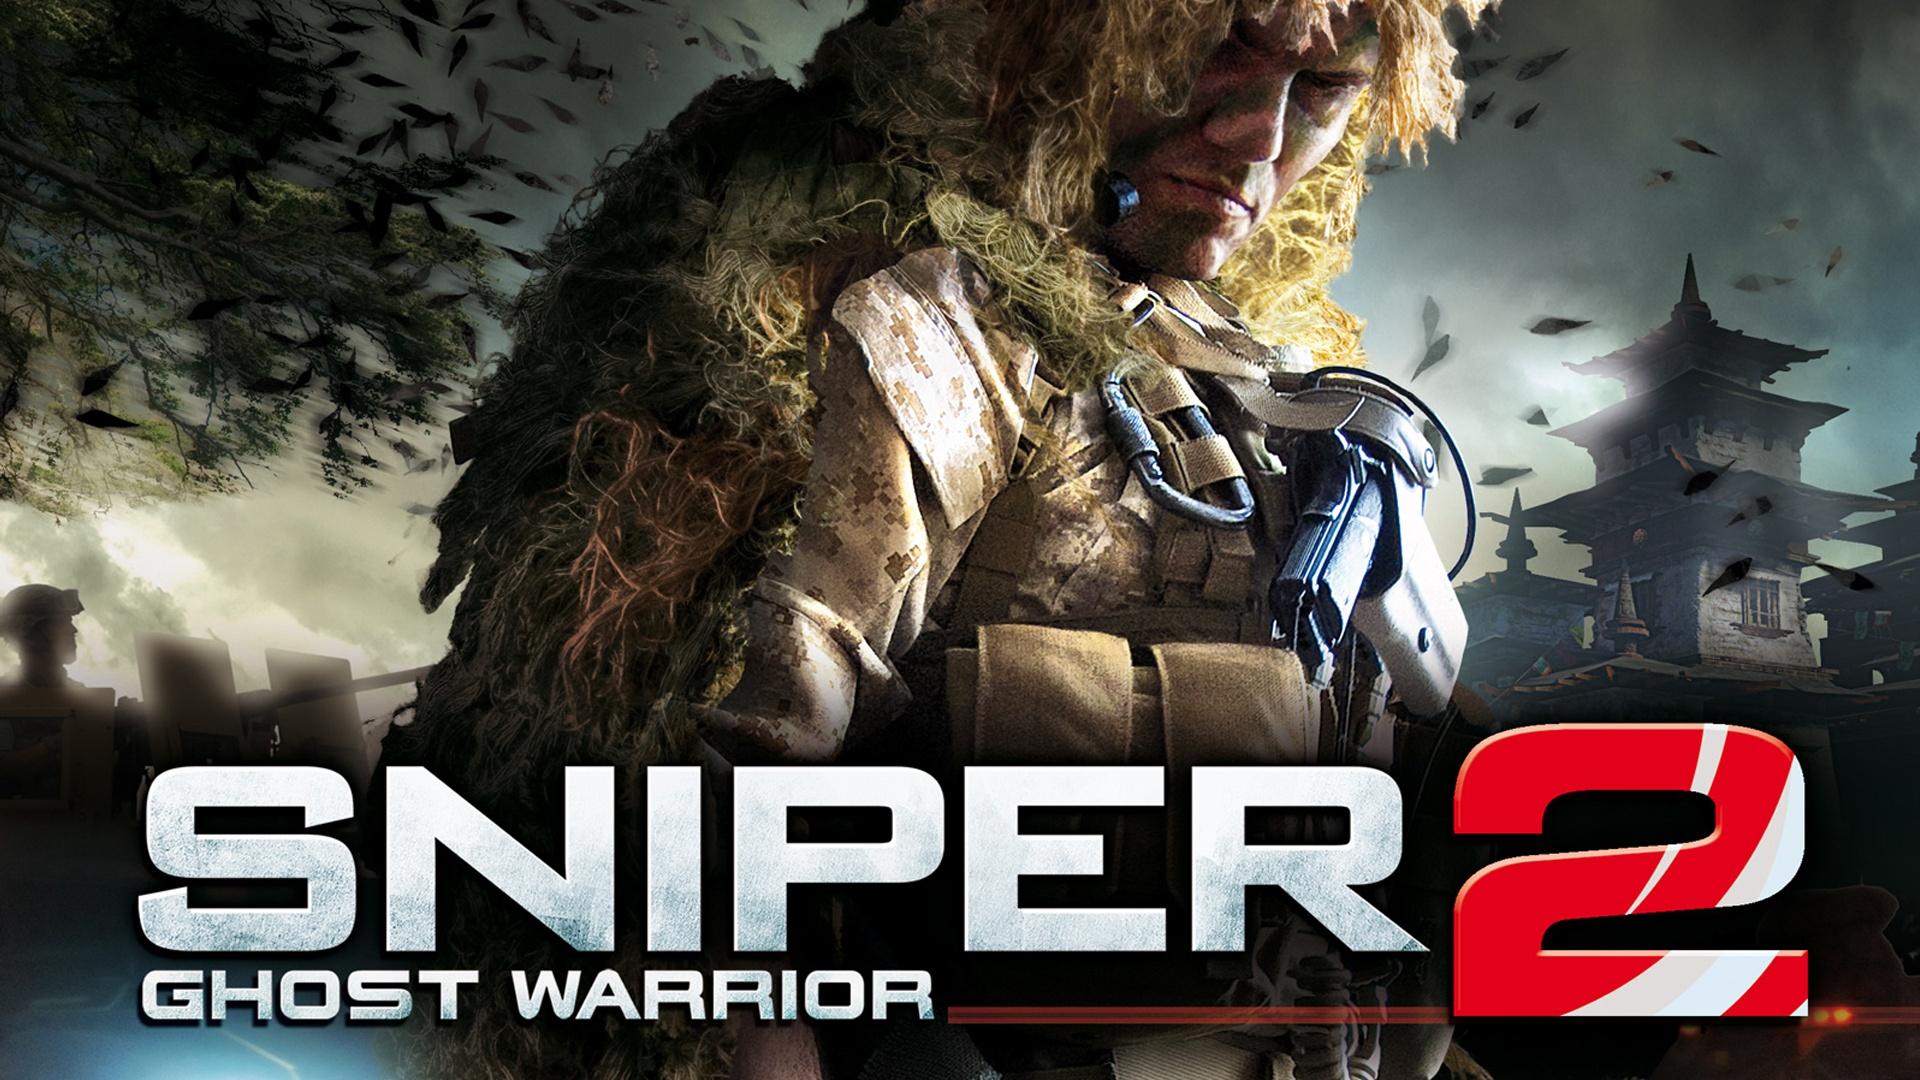 Download Wallpaper 1920x1080 Sniper: Ghost Warrior 2 Full ...